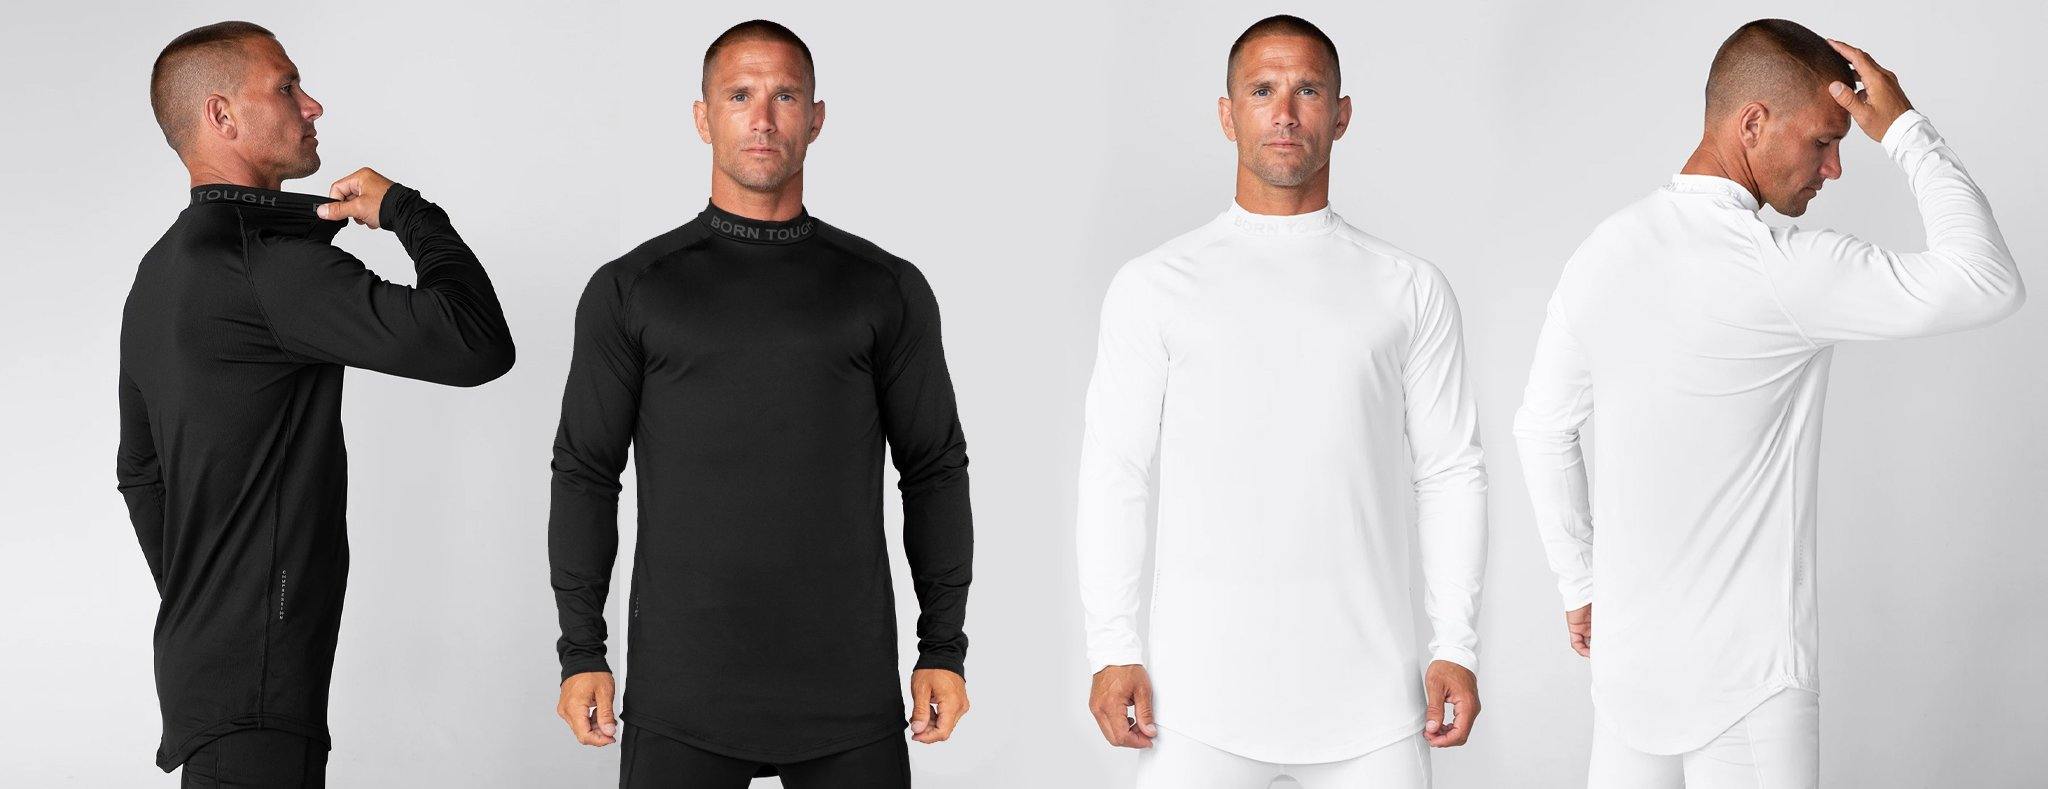 Born Tough Mock Neck Long Sleeve Compression Shirt for Men